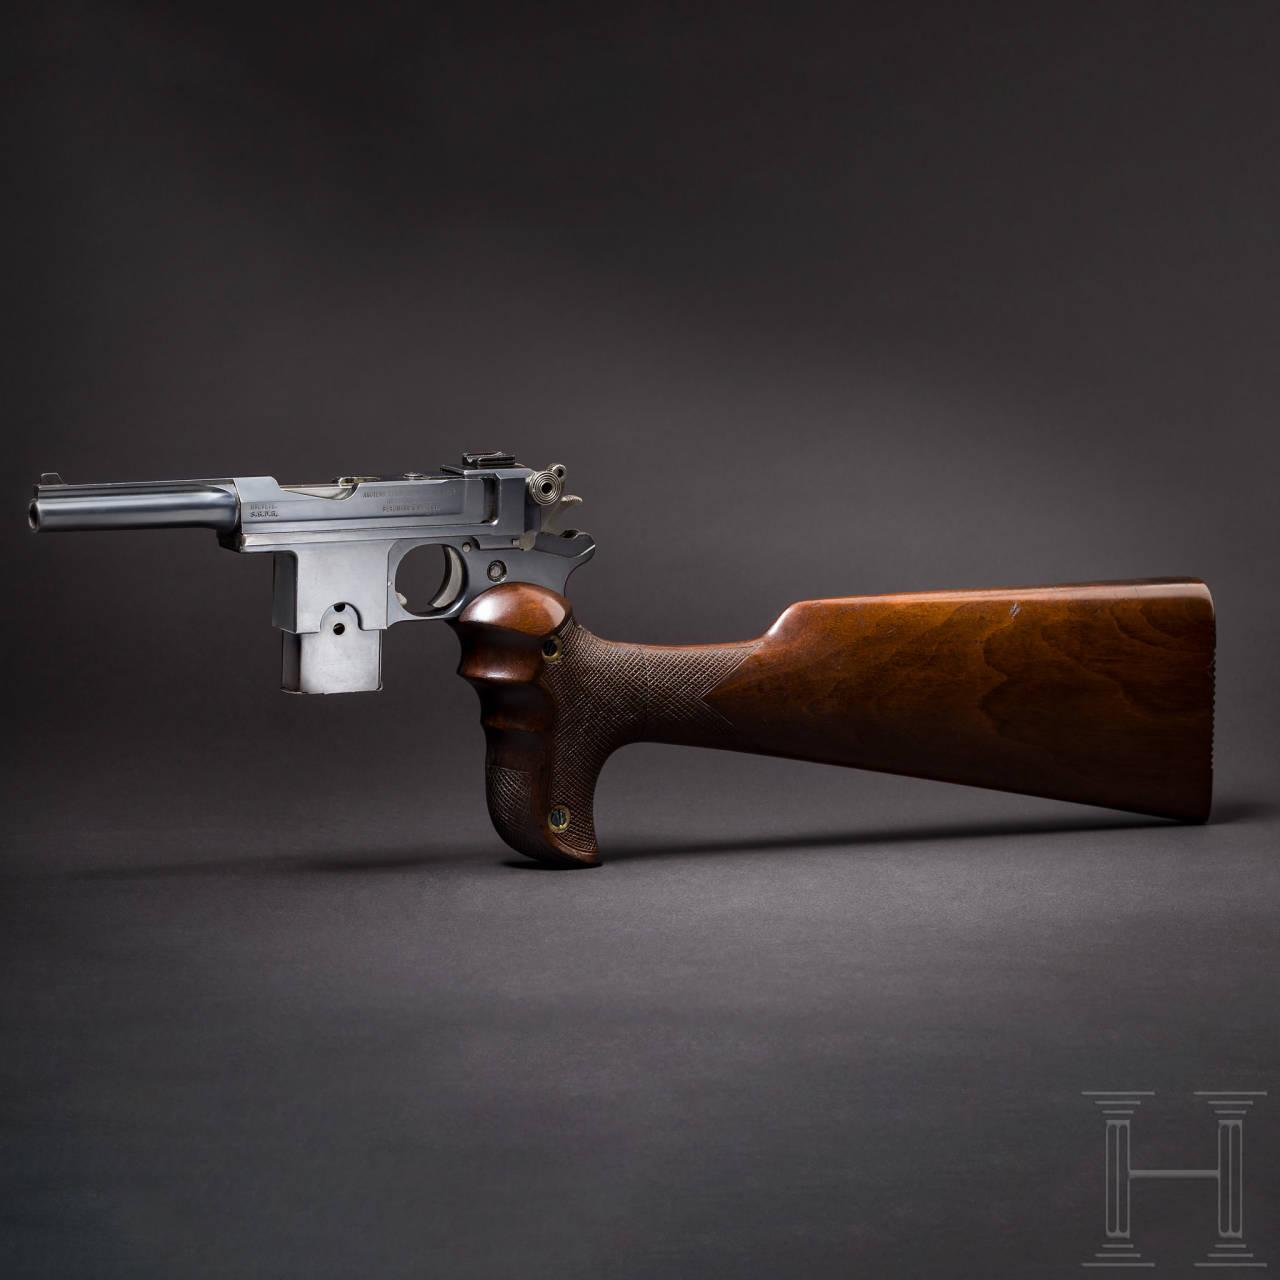 A Bergmann-Bayard Mod. 1908, with shoulder stock